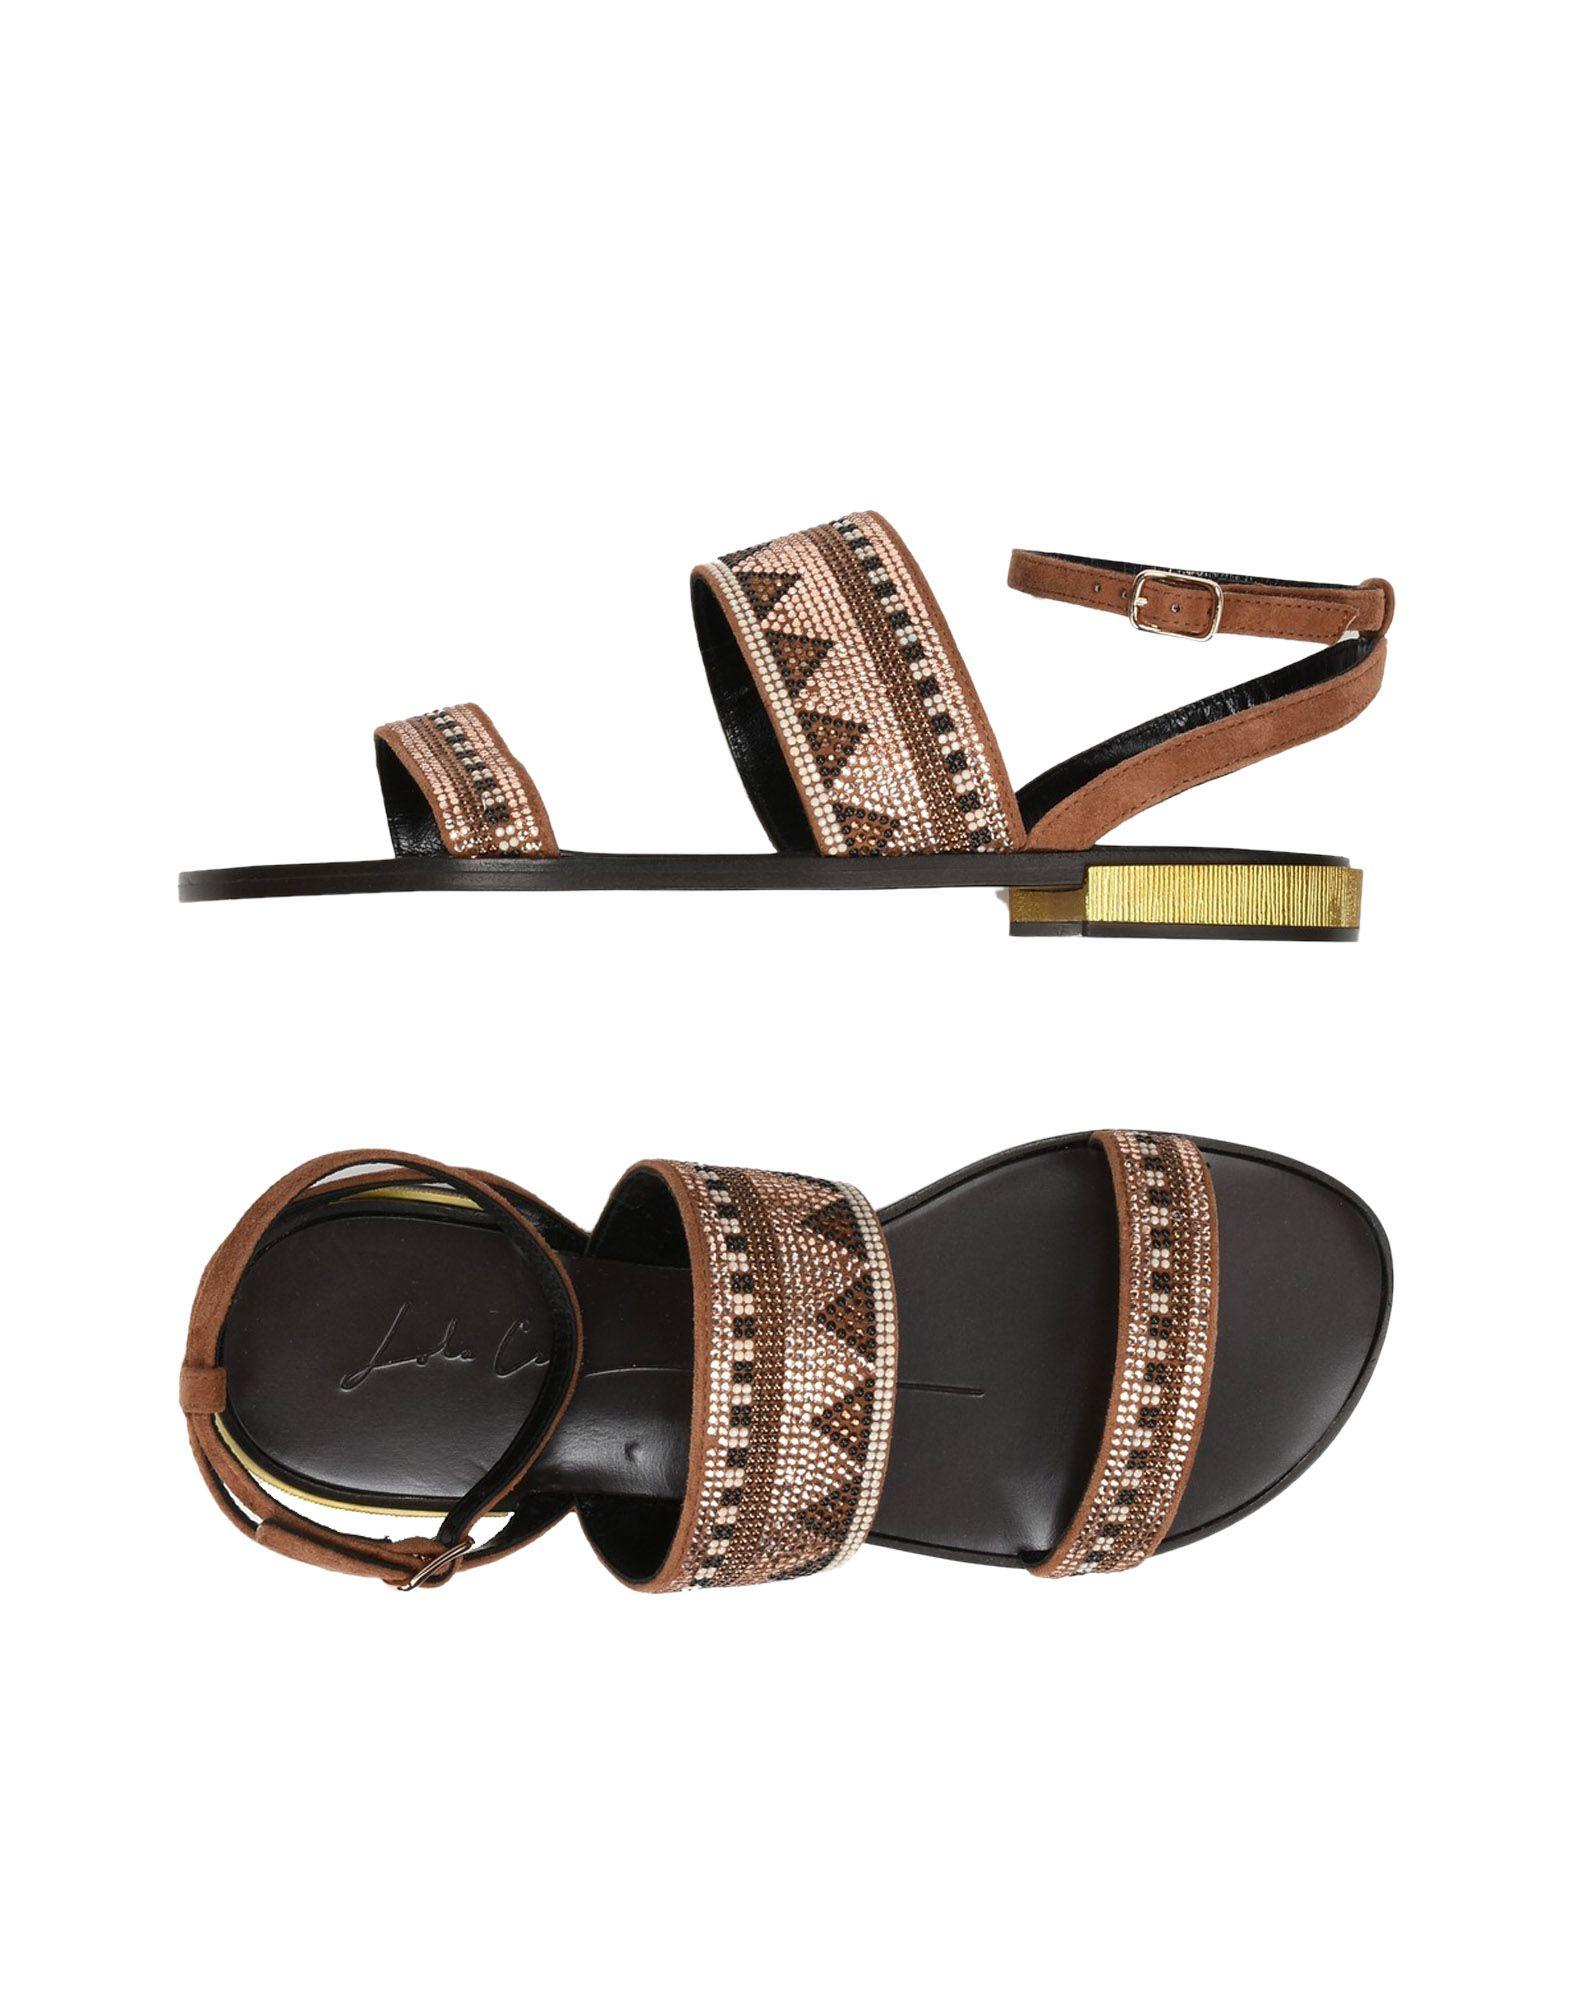 Lola Cruz Sandalen Damen  11346969HC Gute Qualität beliebte Schuhe